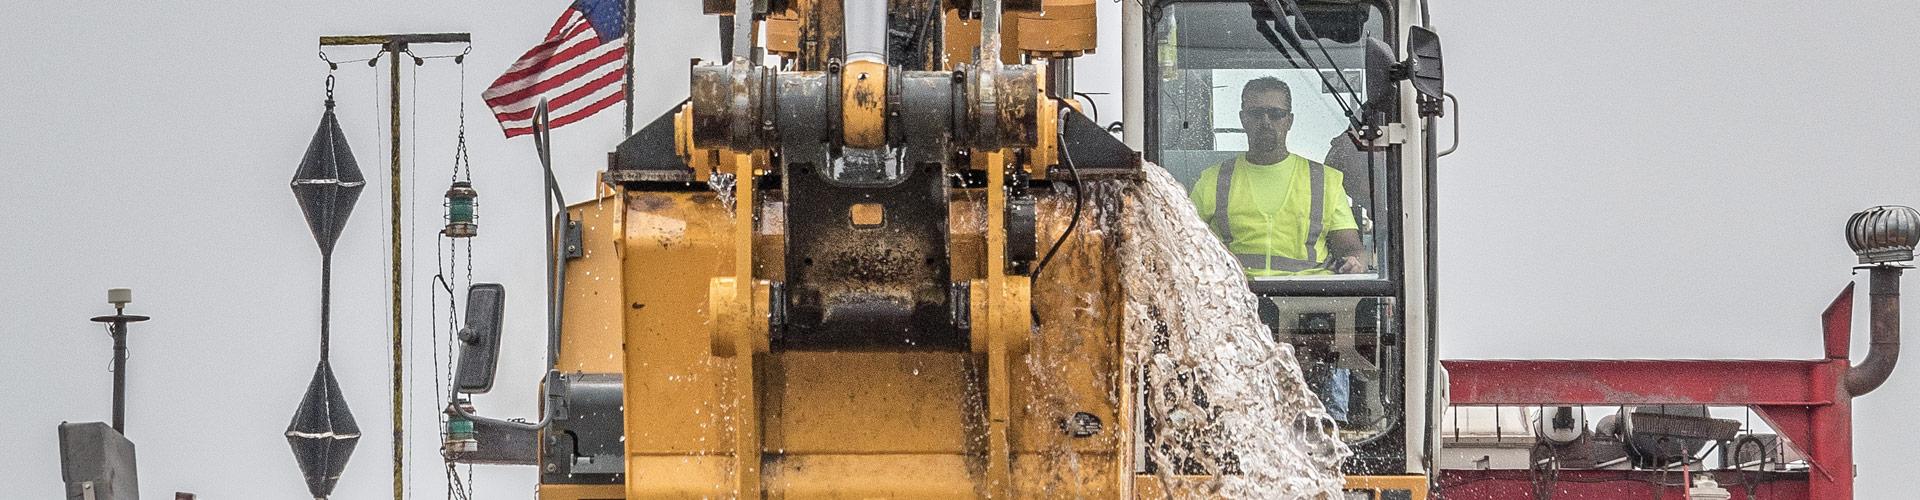 Environmental Dredging, Mechanical Dredging, Environmental Remediation, Environmental Cleanup